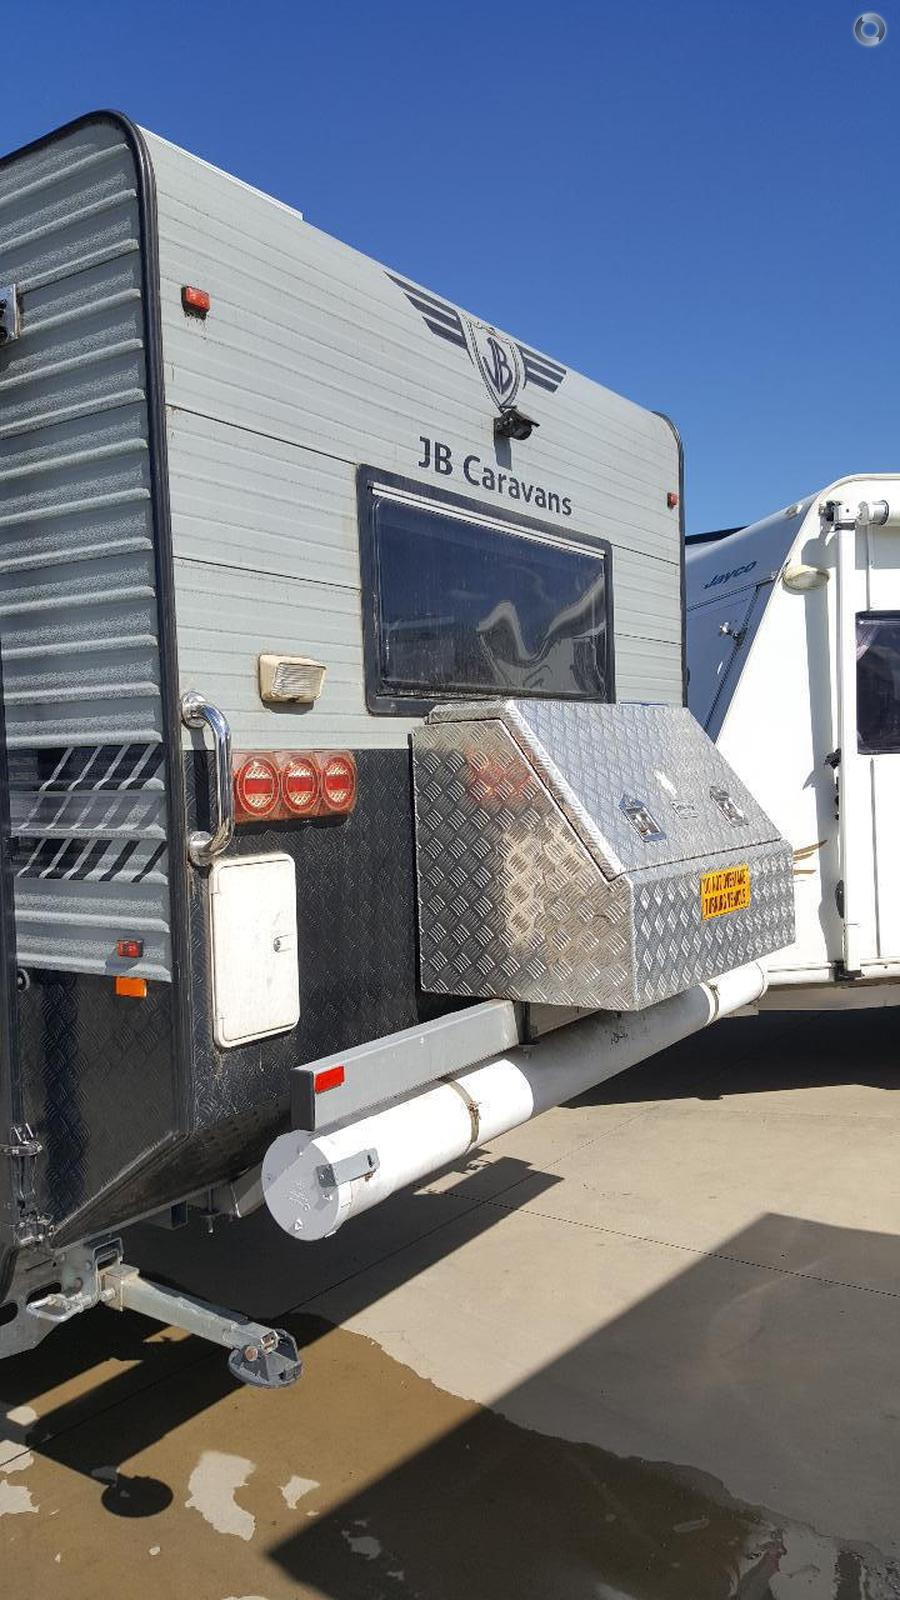 2013 Jb Caravans Scorpion Outback